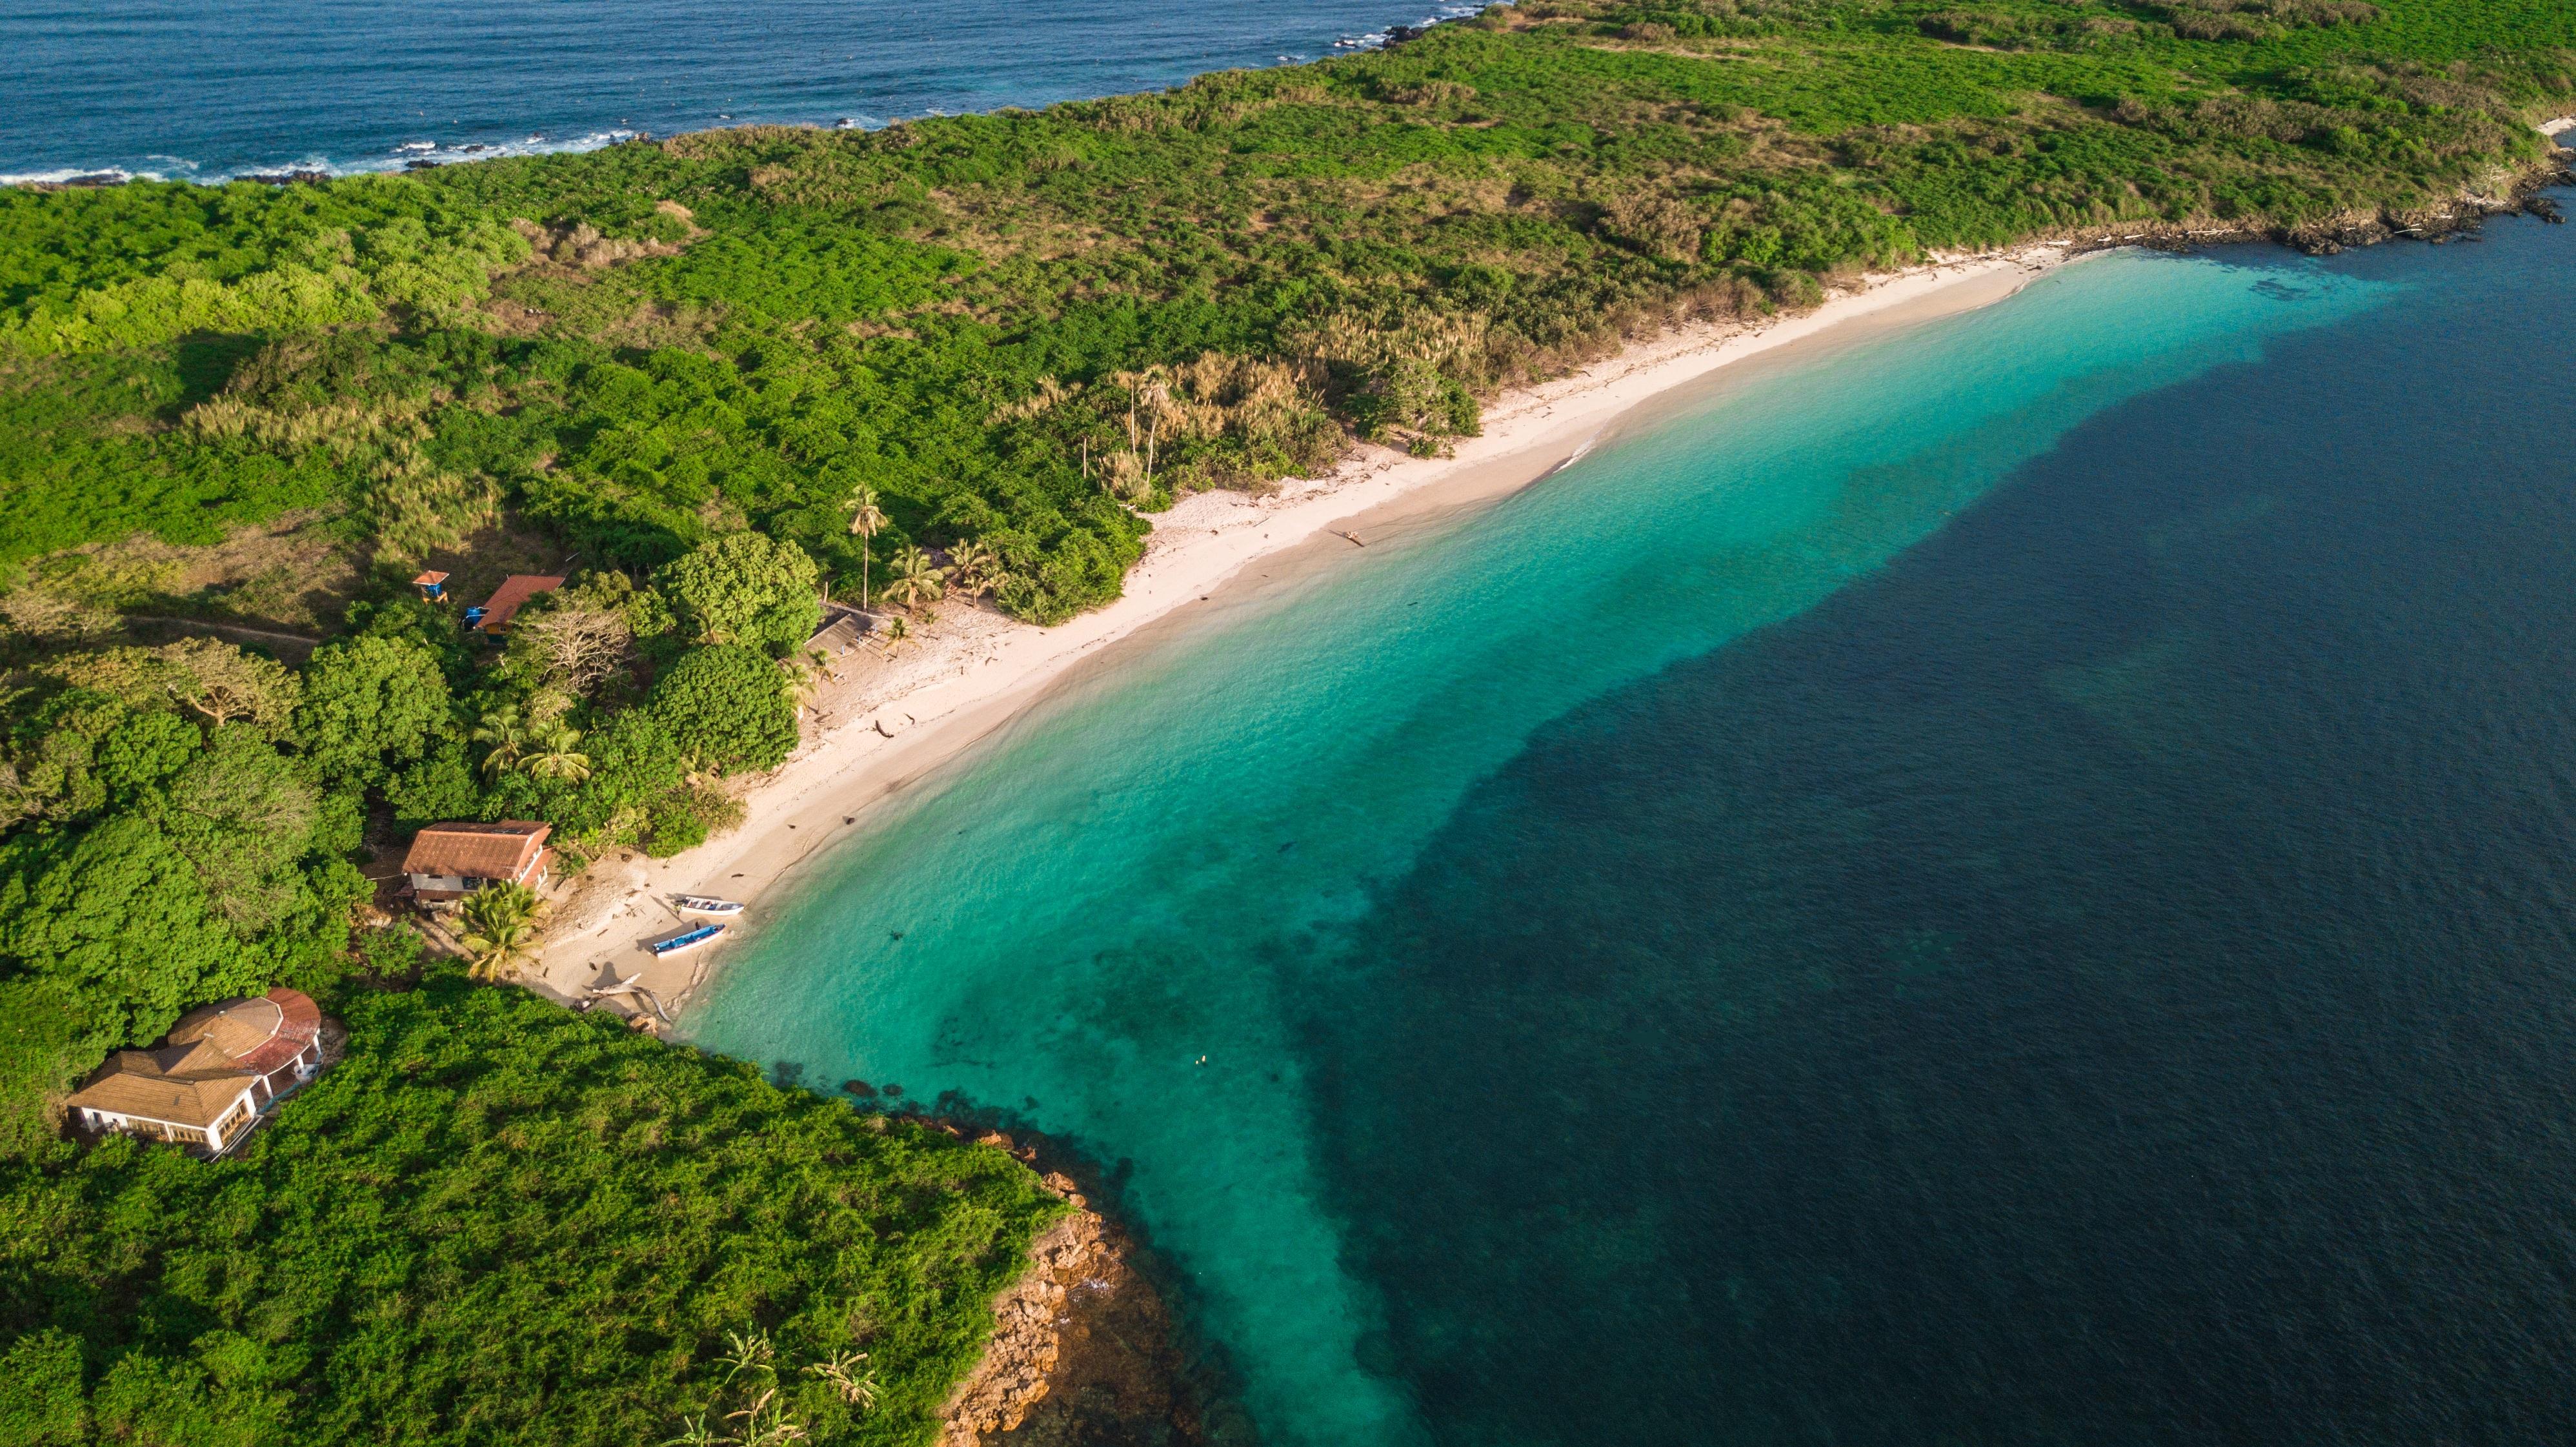 isla-iguana-los-santos-strand